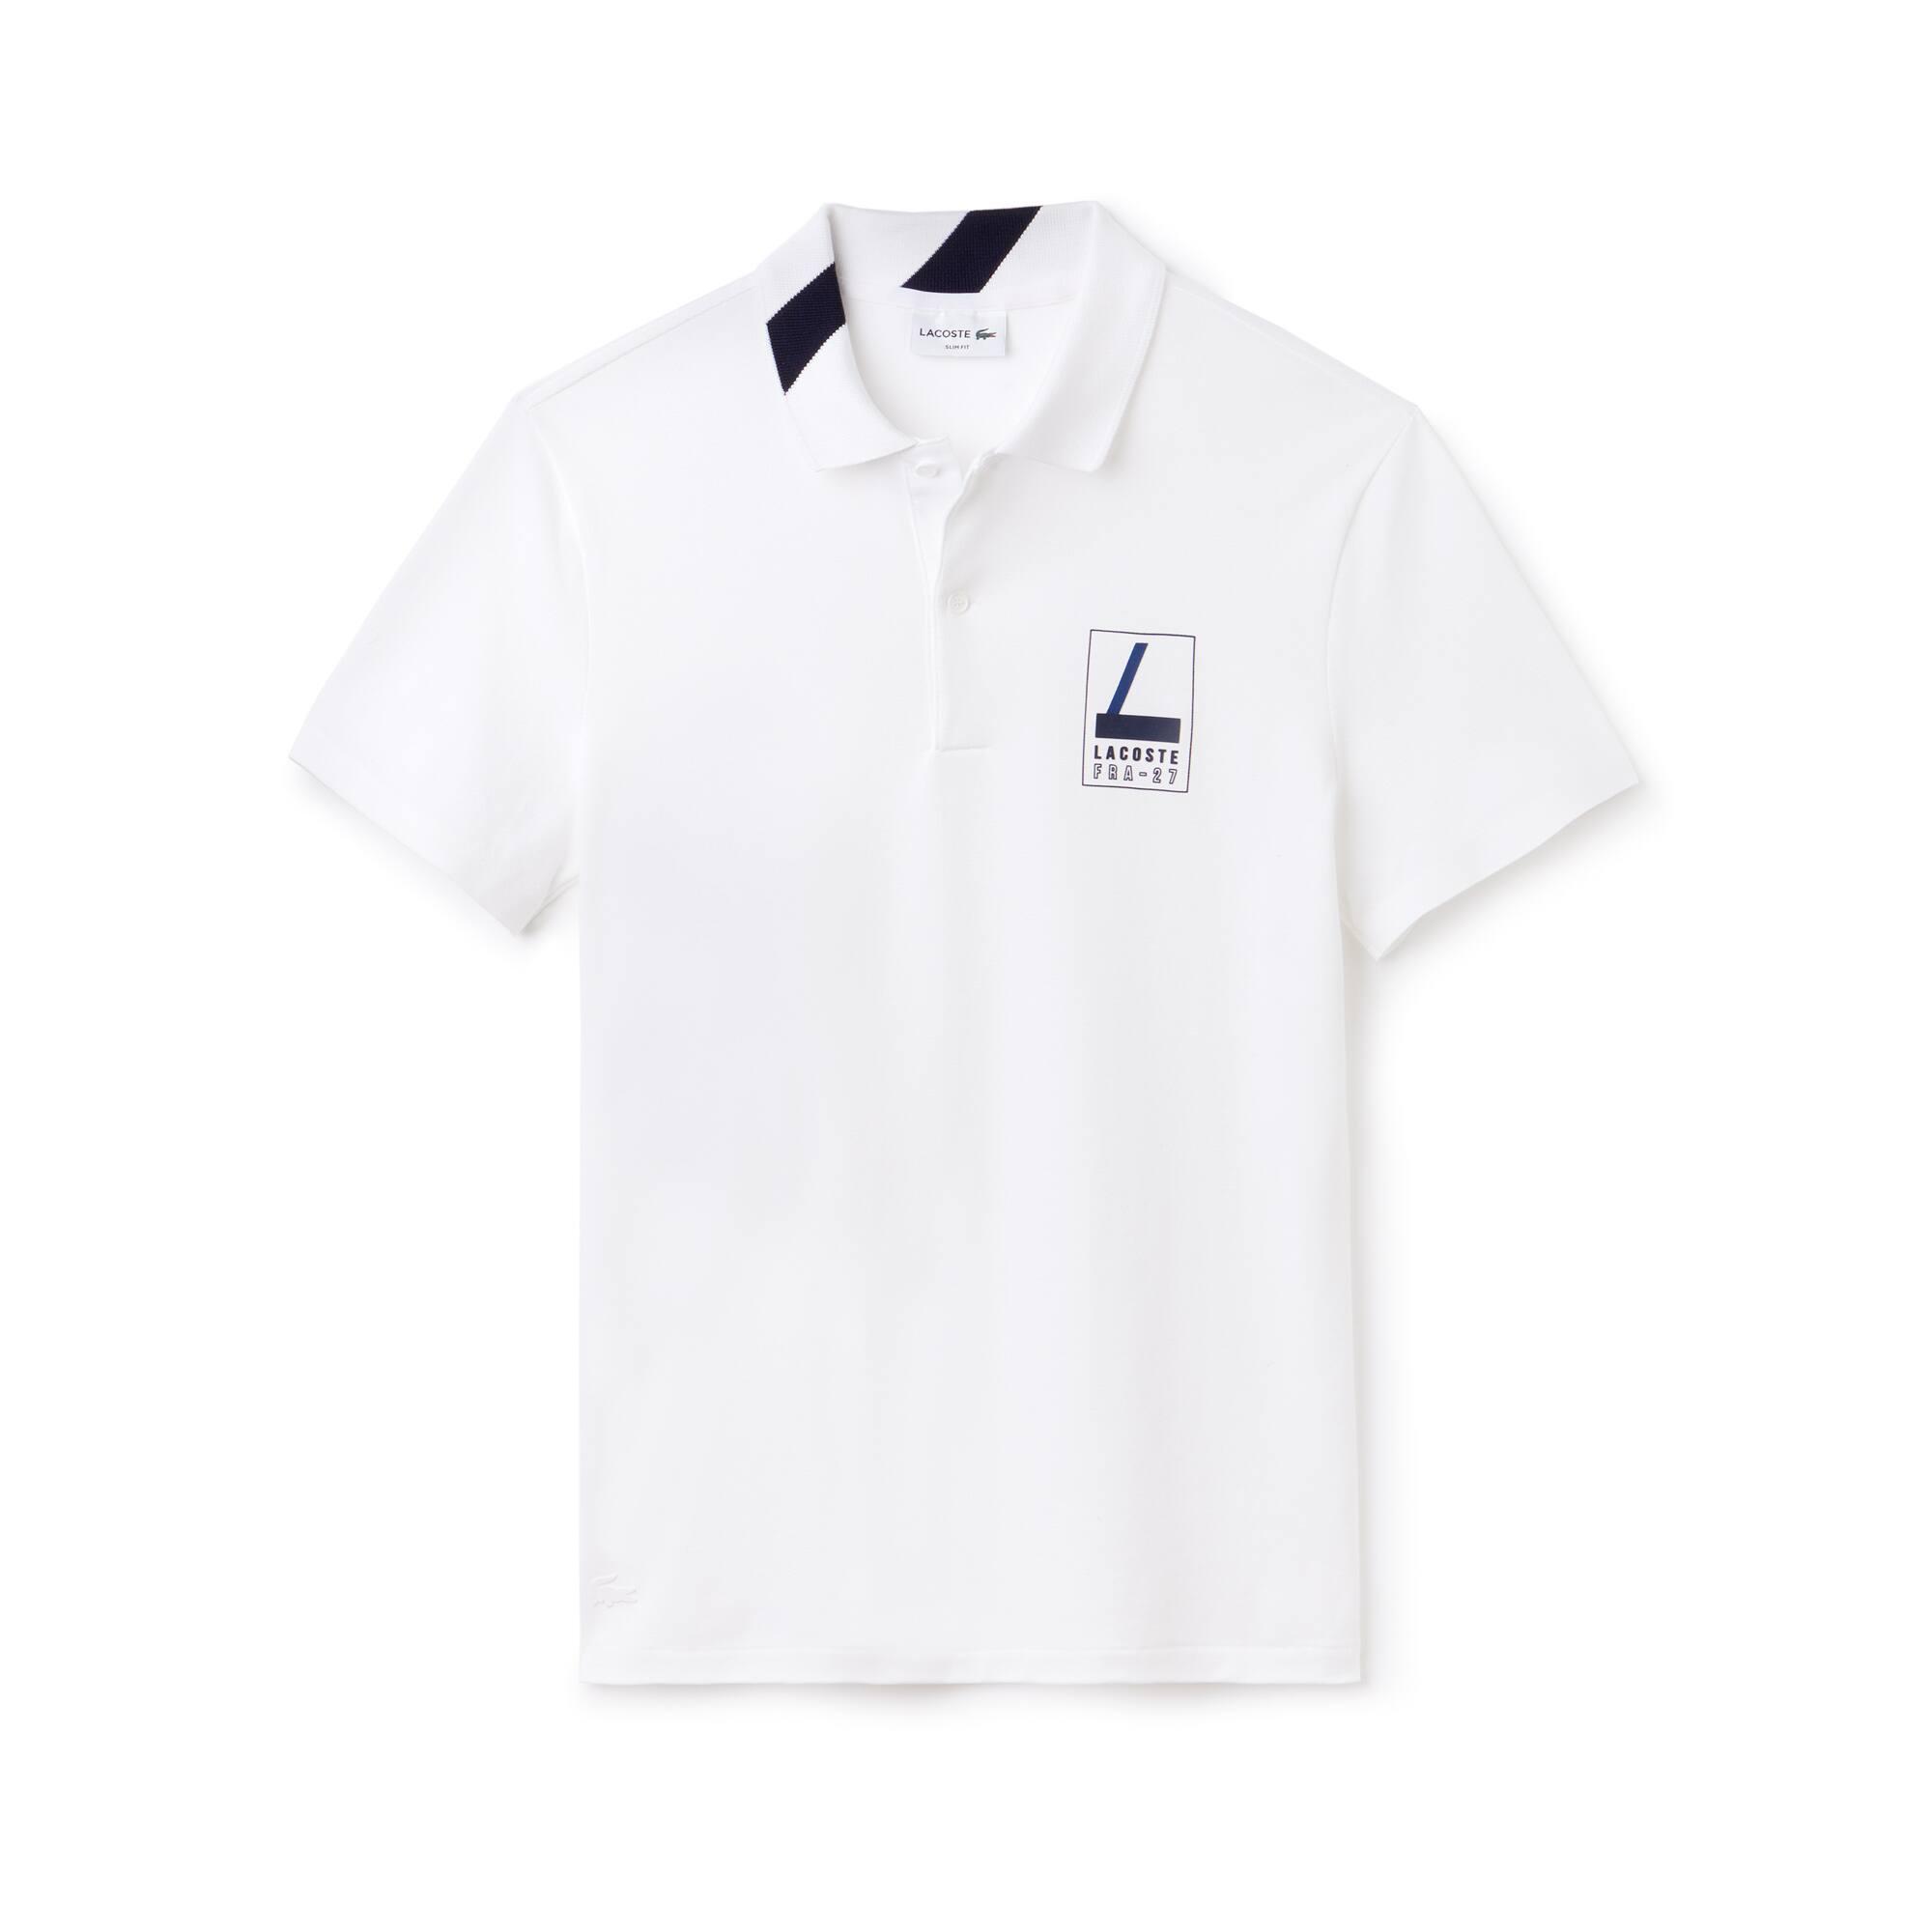 best service 6869b 1d4b8 Herren LACOSTE Slim Fit Mini-Piqué Poloshirt mit Schriftzug